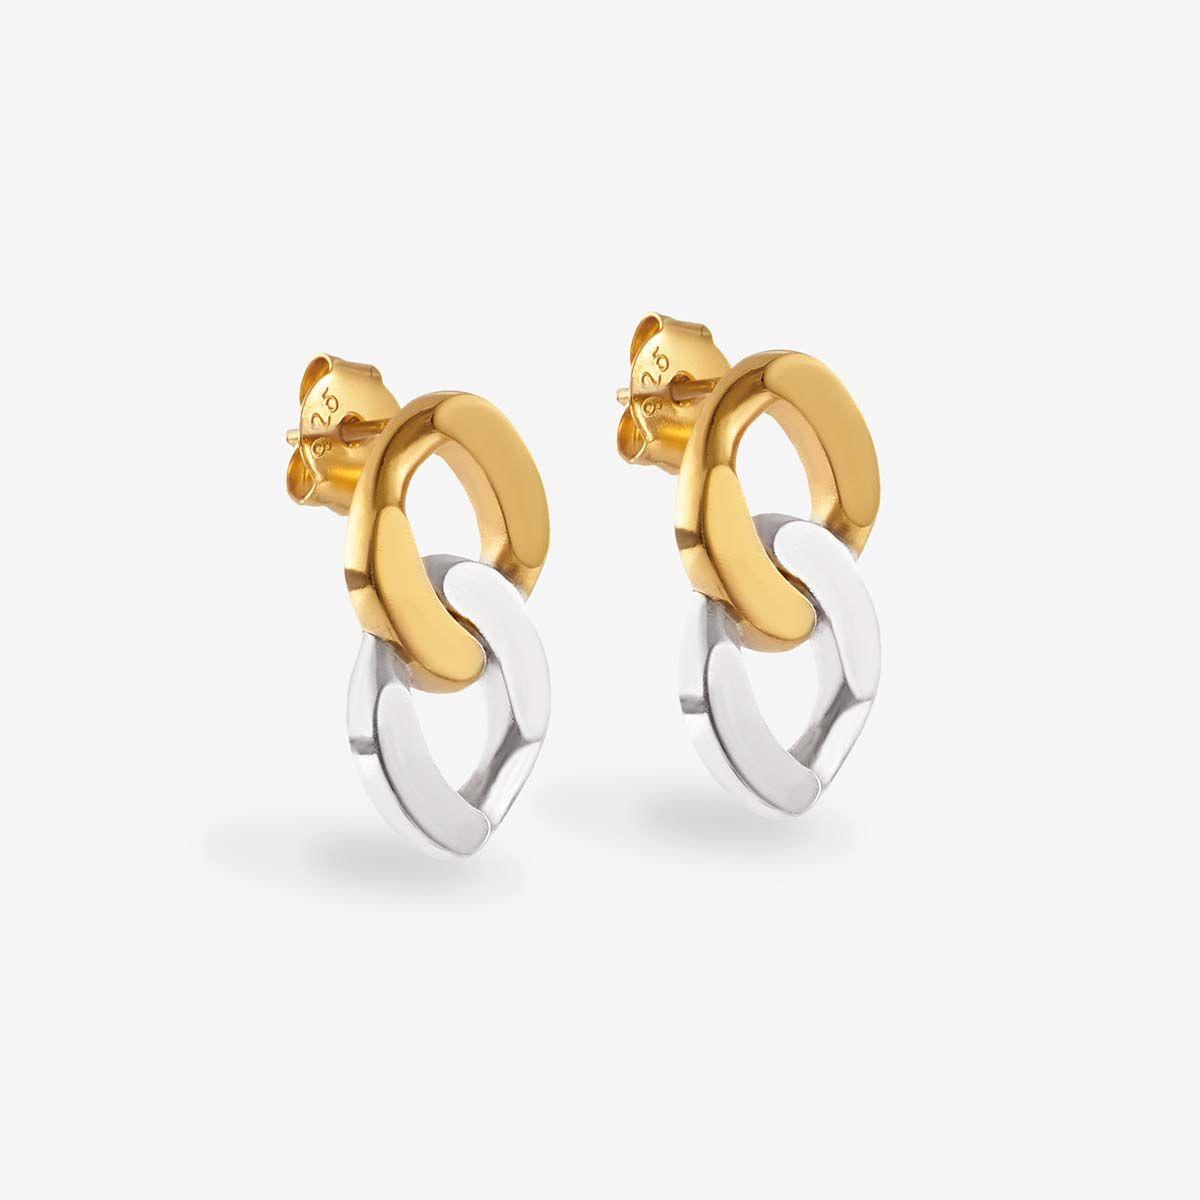 Peaches - Ohrstecker - Silber & Gold